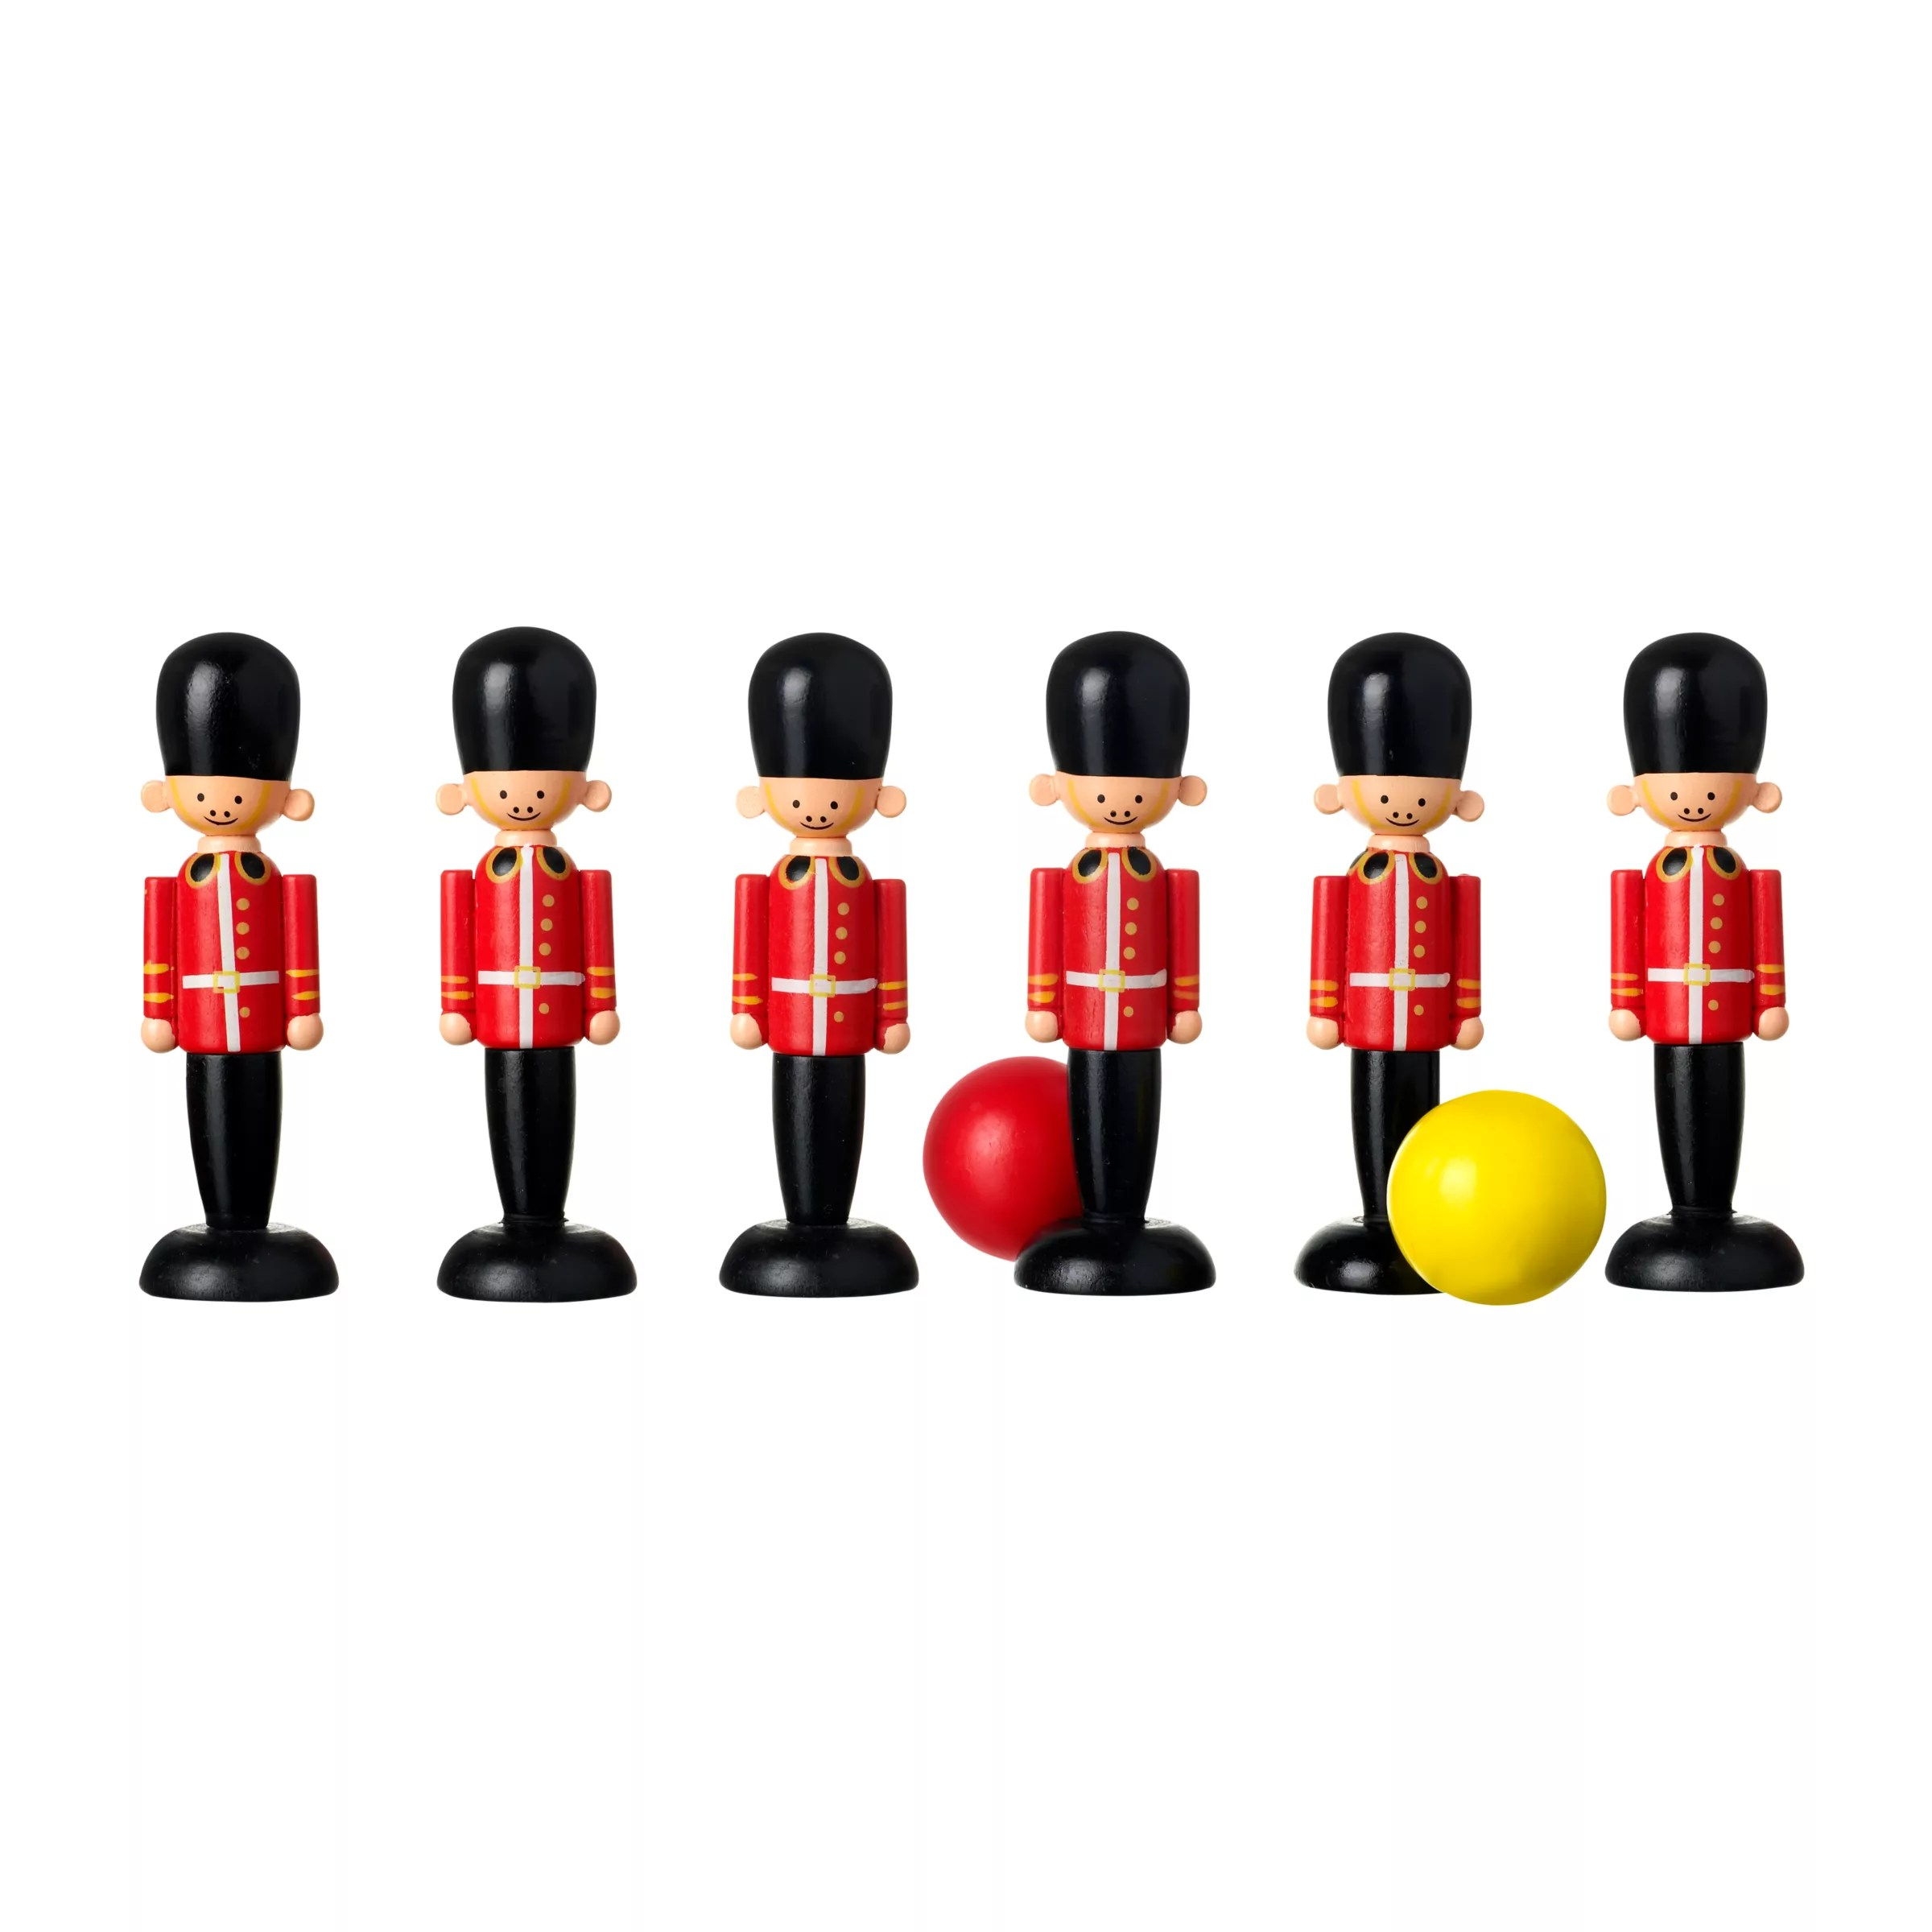 Buy Orange Tree Soldier Wooden Toy Skittles John Lewis